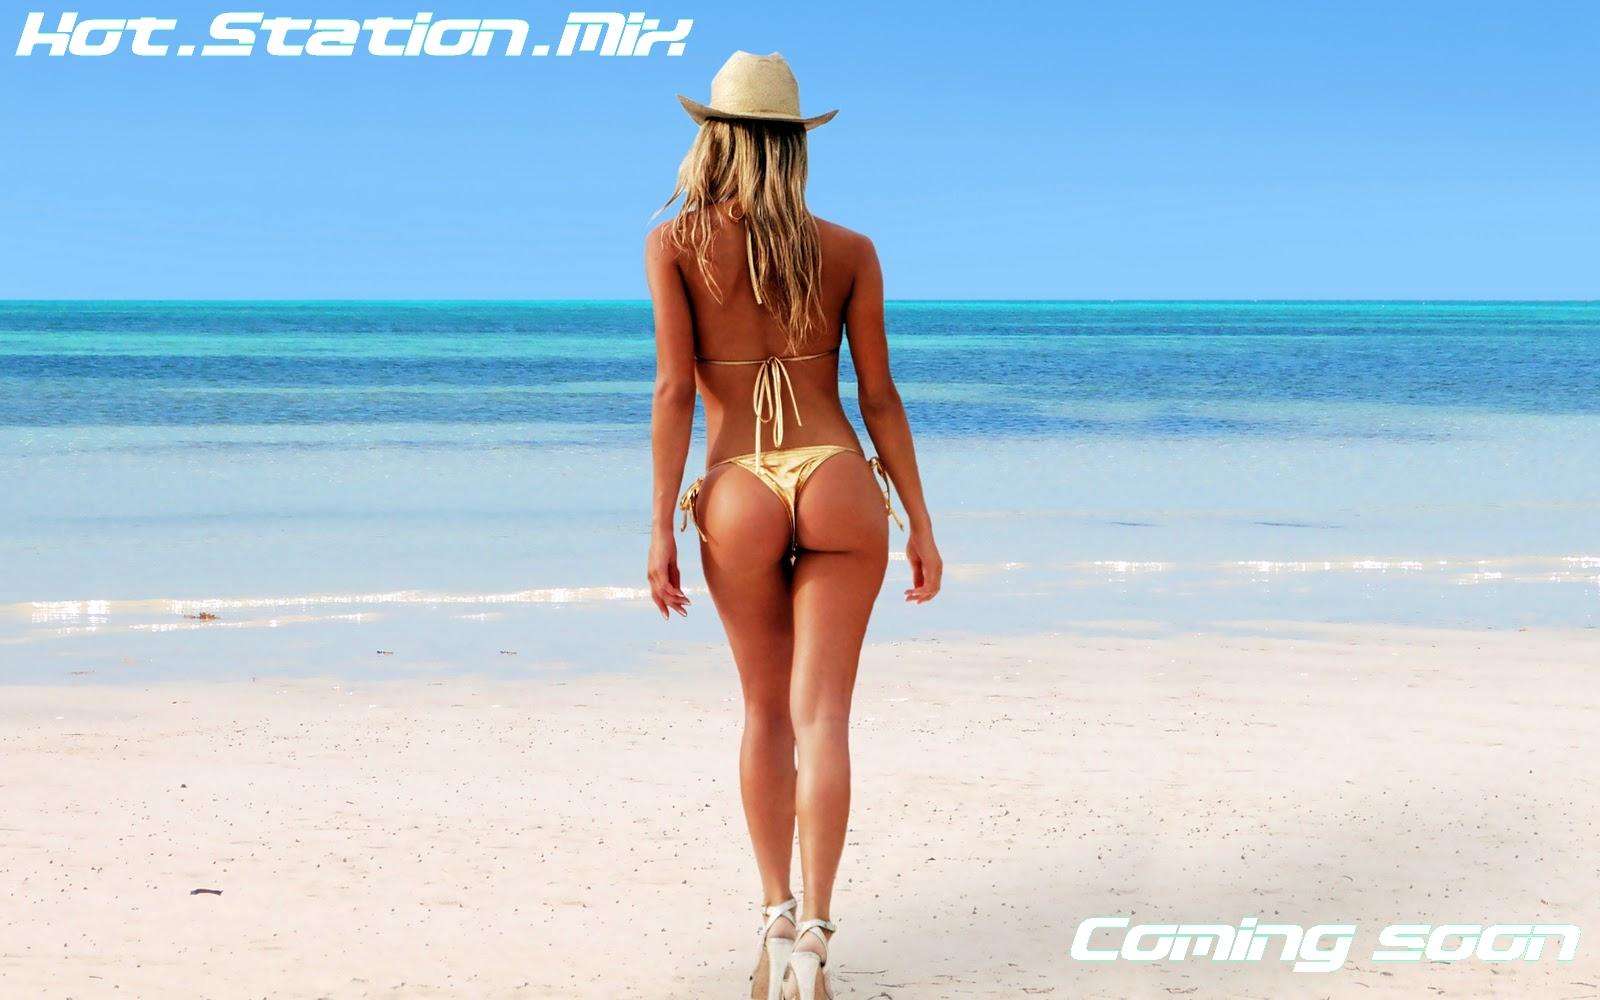 http://2.bp.blogspot.com/-C-H4KgpWzwE/TndvxcxzXJI/AAAAAAAAAQ0/fGvJGAN8SsA/s1600/hotstation.jpg